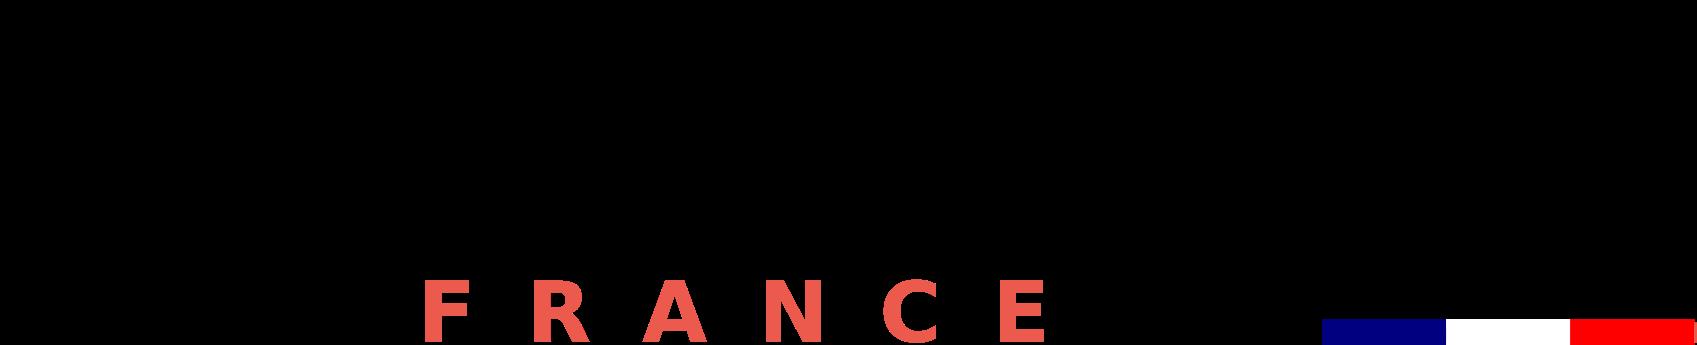 2018_01_02_Leanin_logo_france2.png